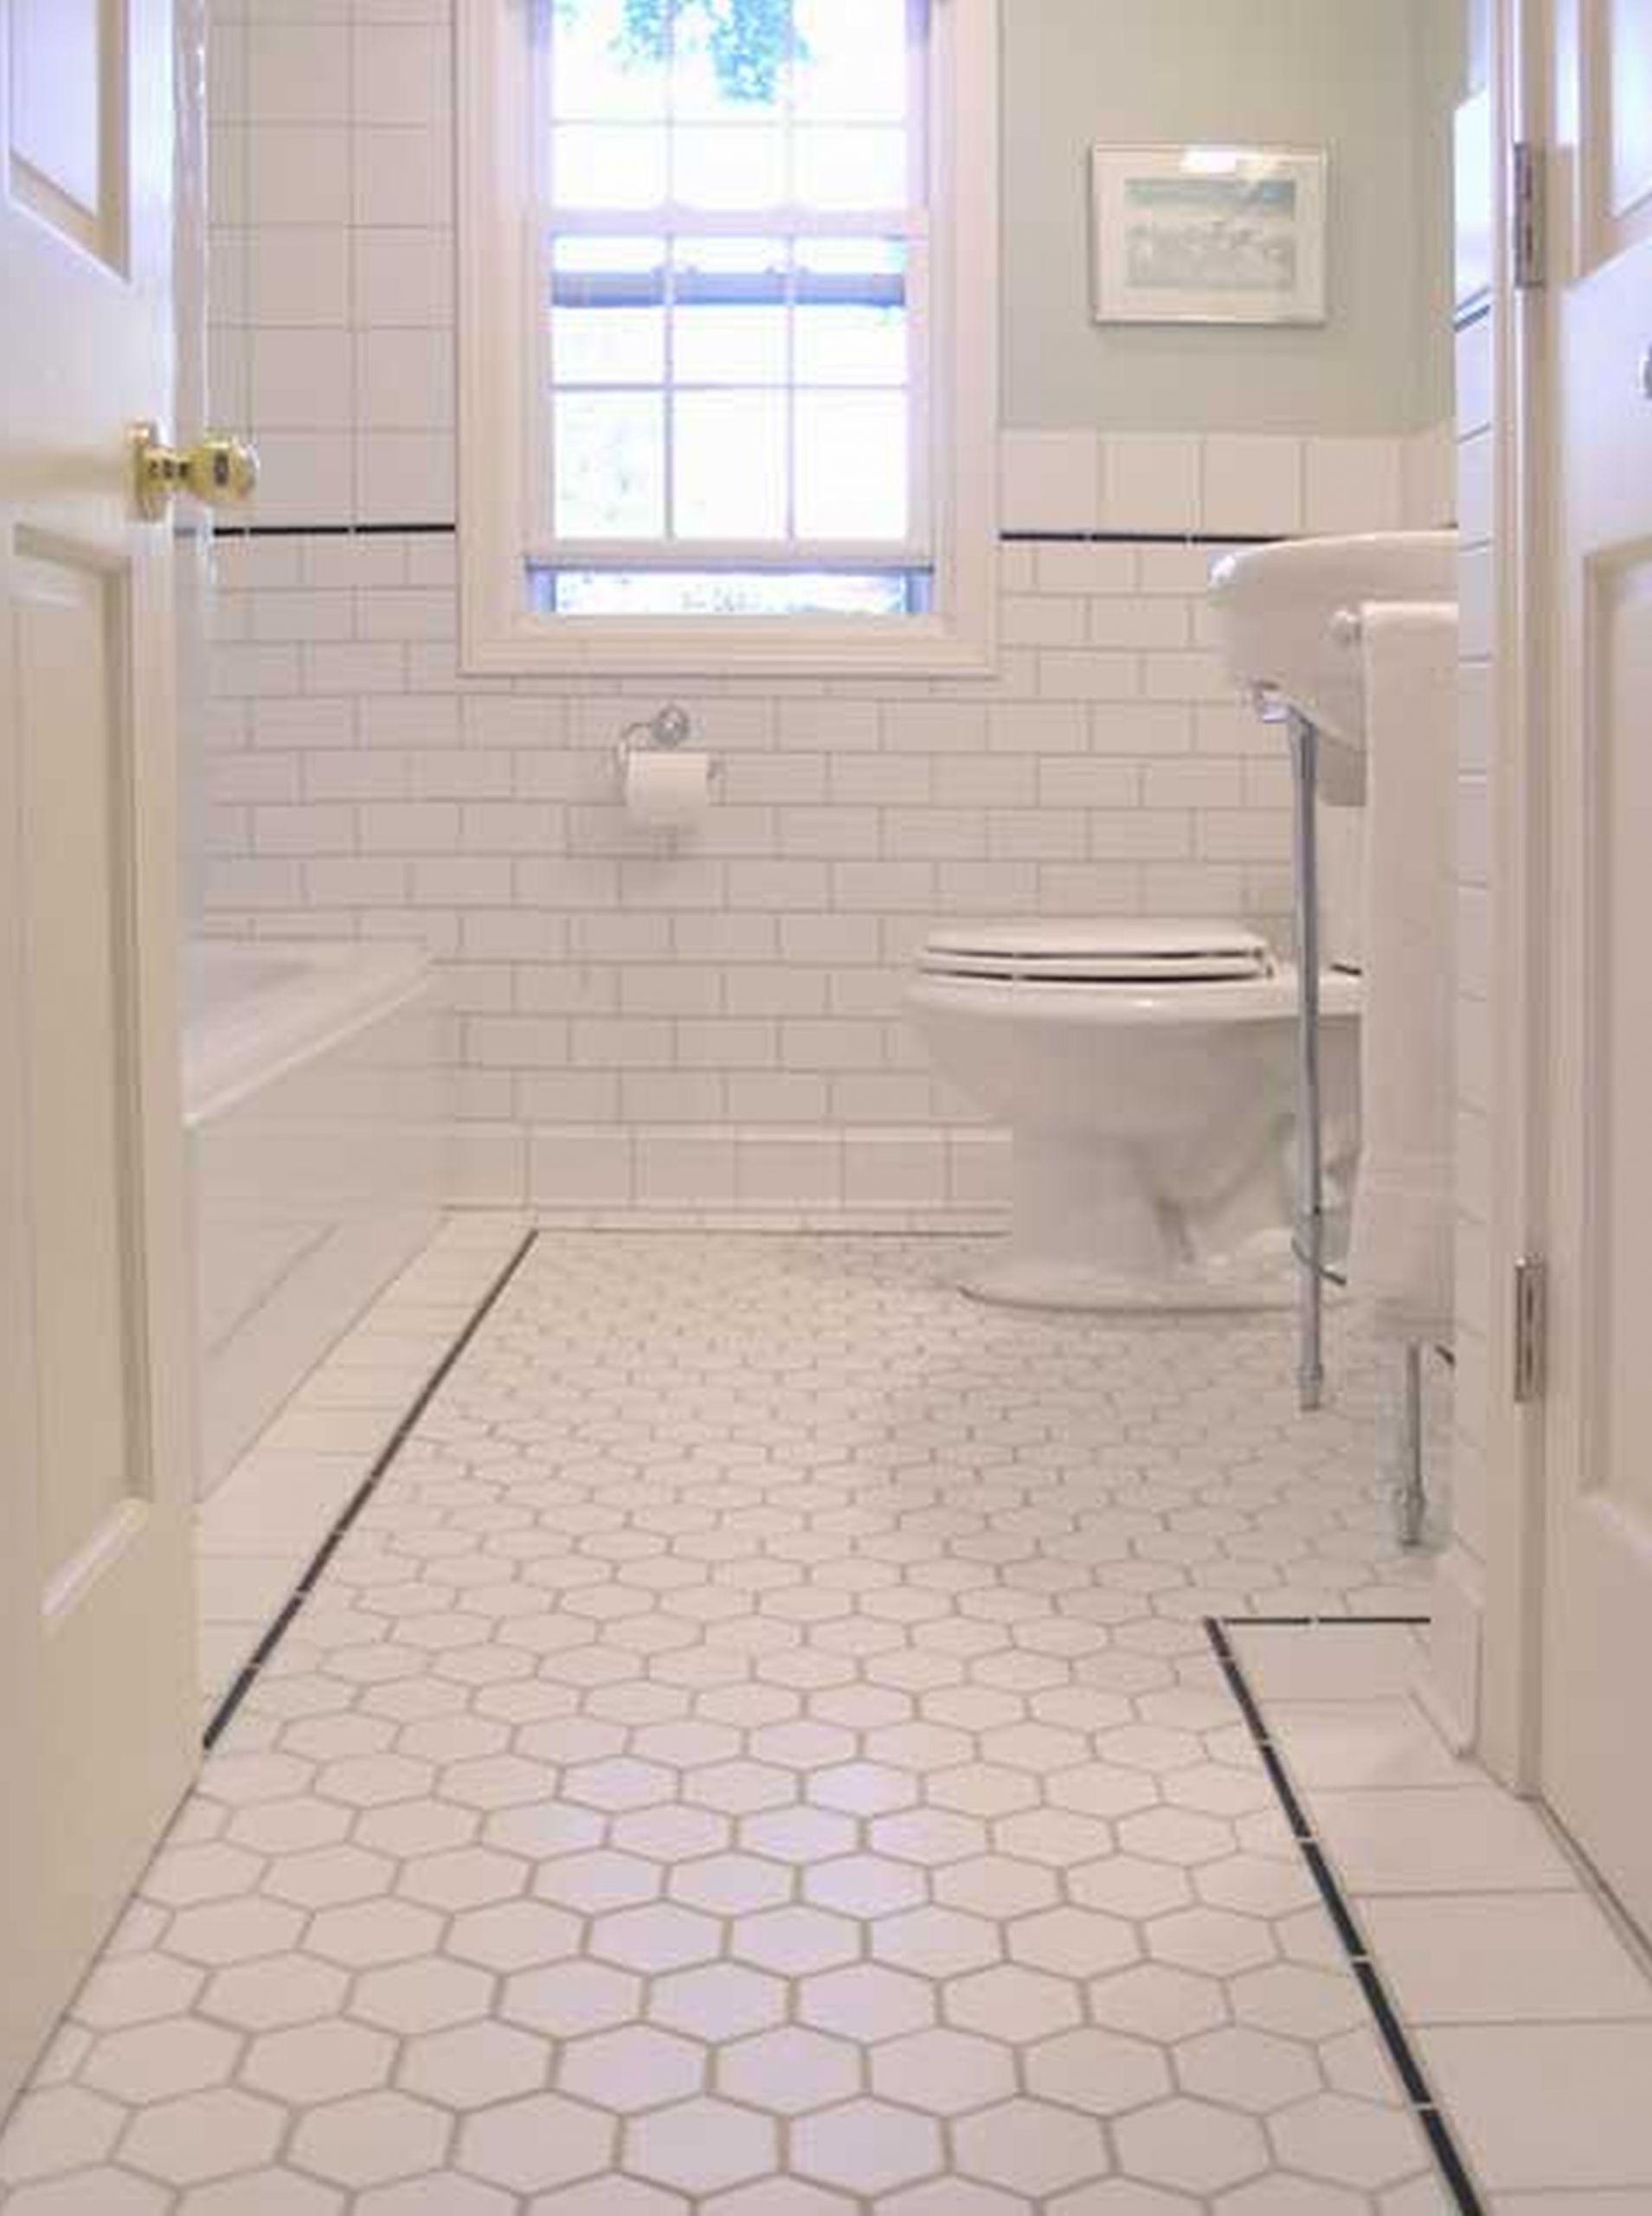 Bathroom Ceramic Floor Tile Ideas  36 nice ideas and pictures of vintage bathroom tile design